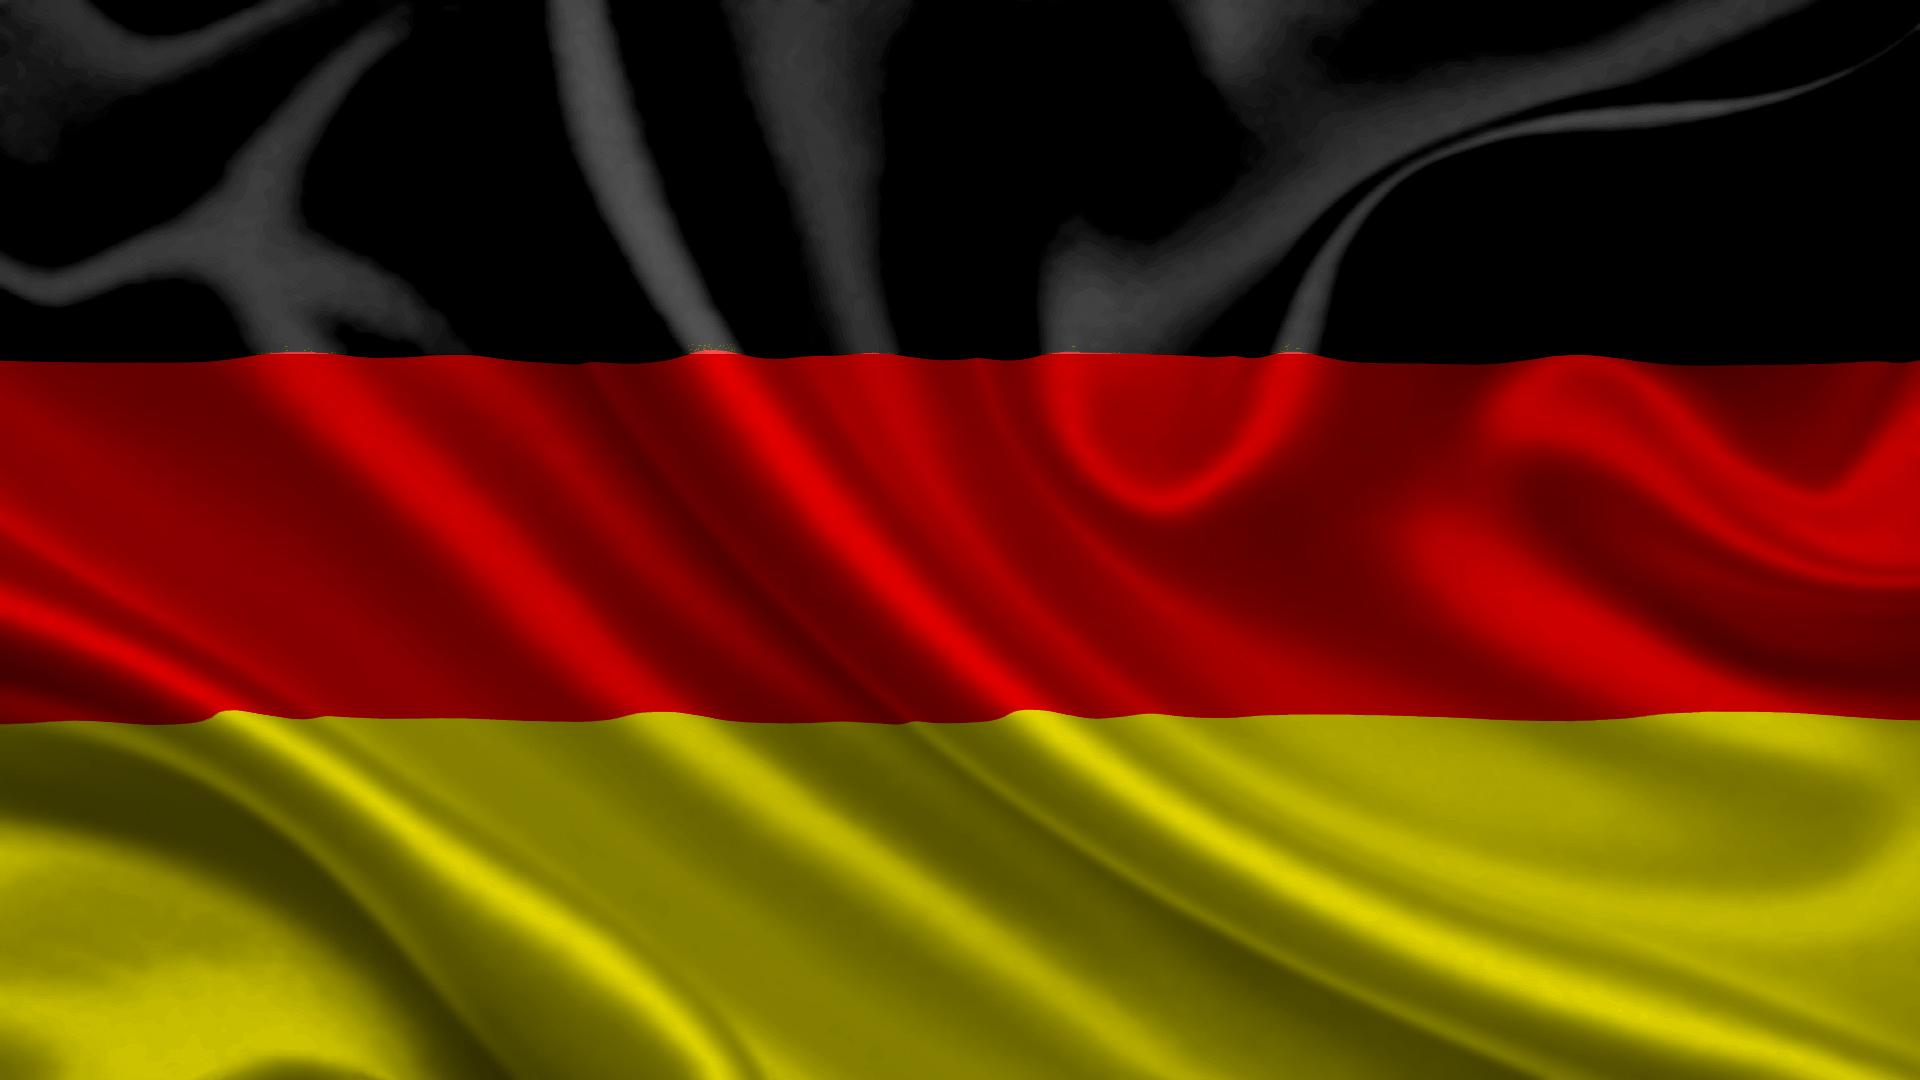 german flag wallpaper 1920x1080